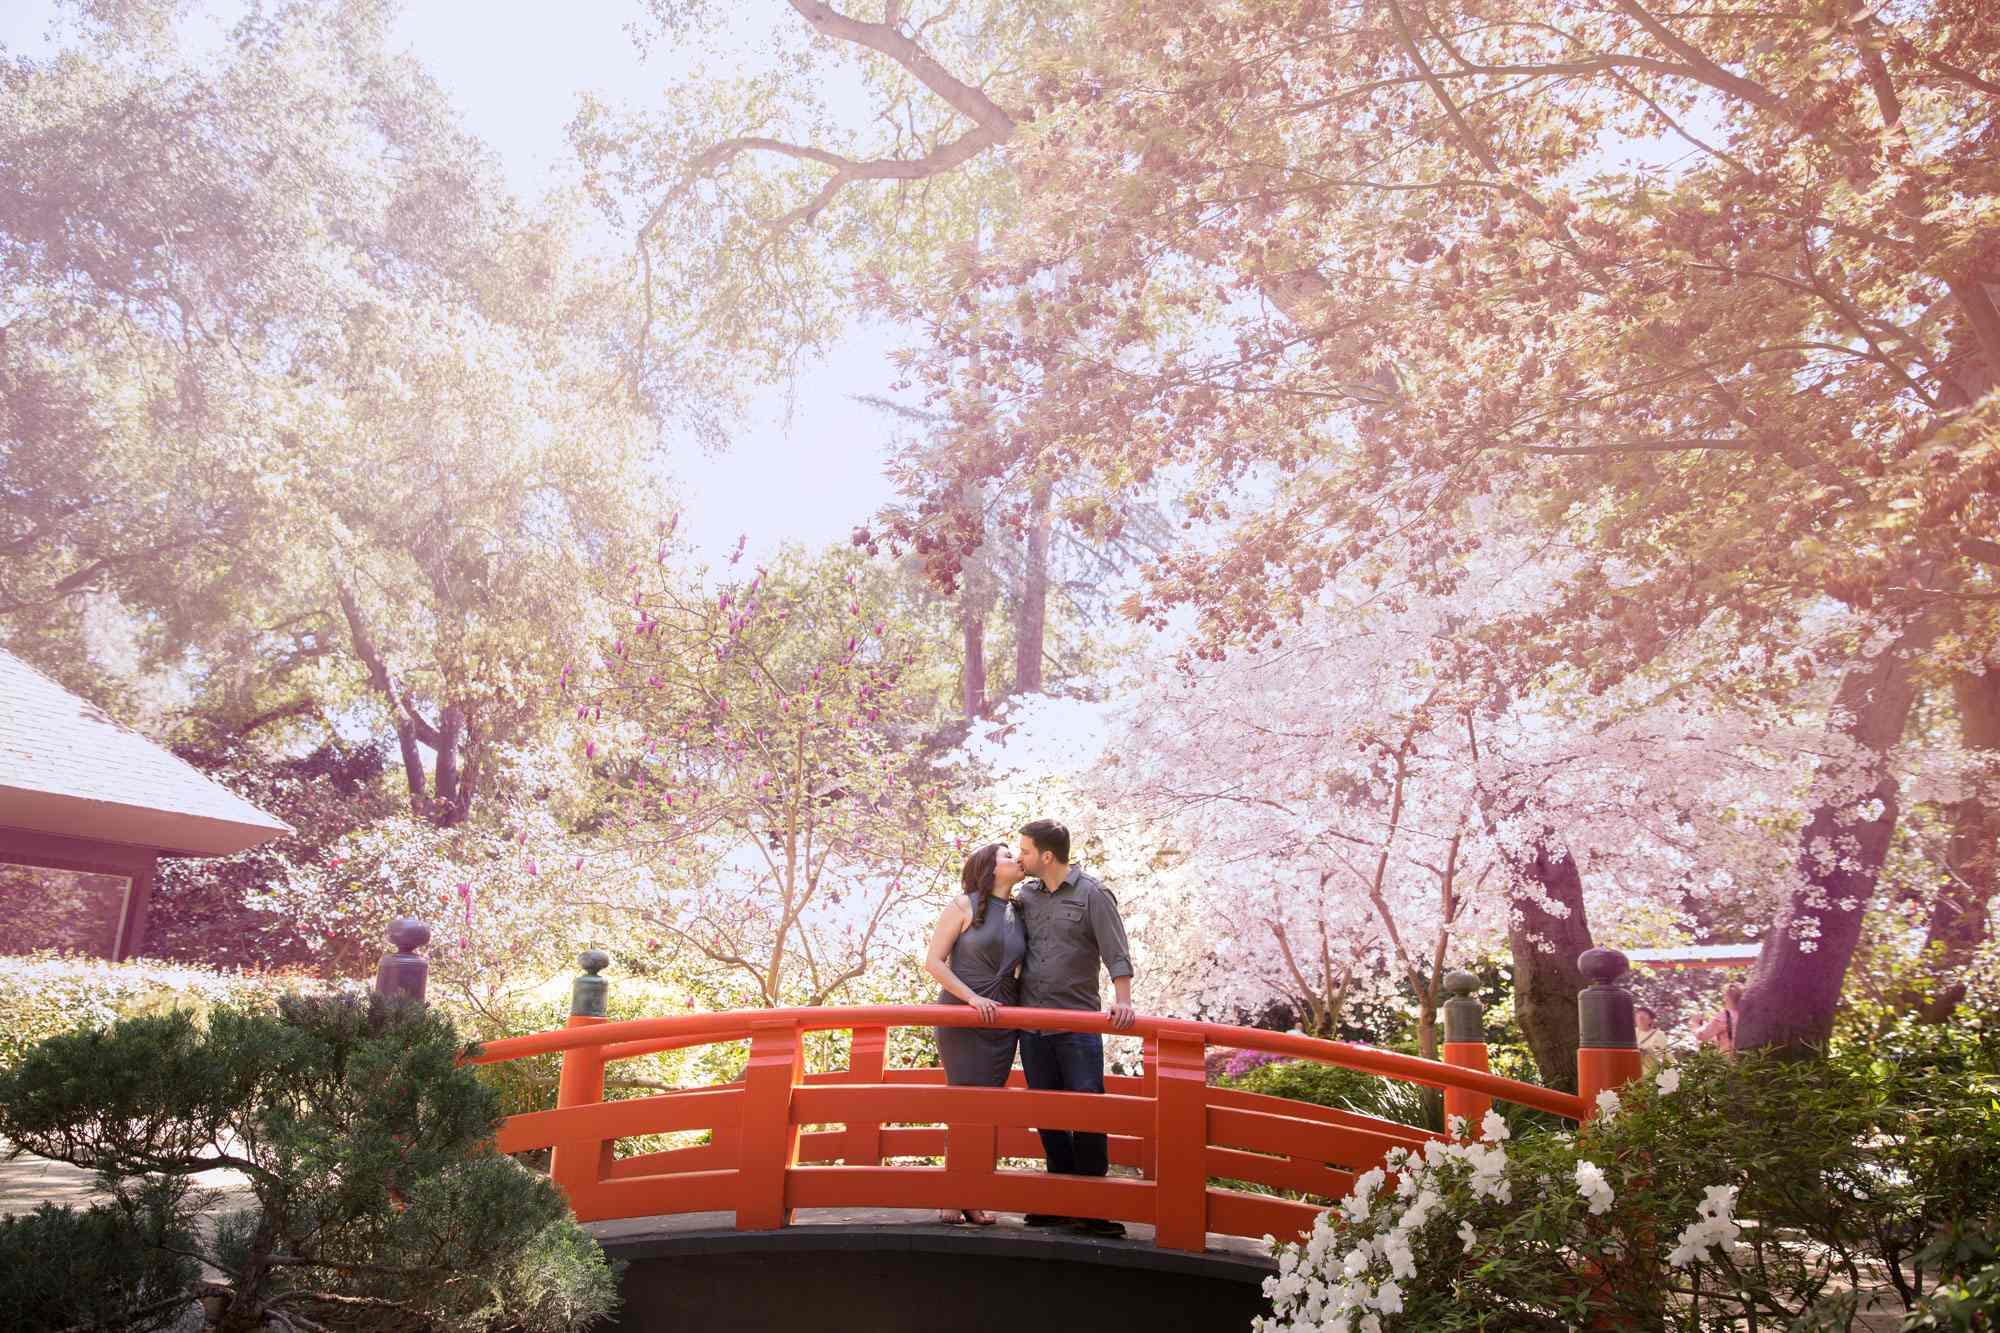 Romantic Shots